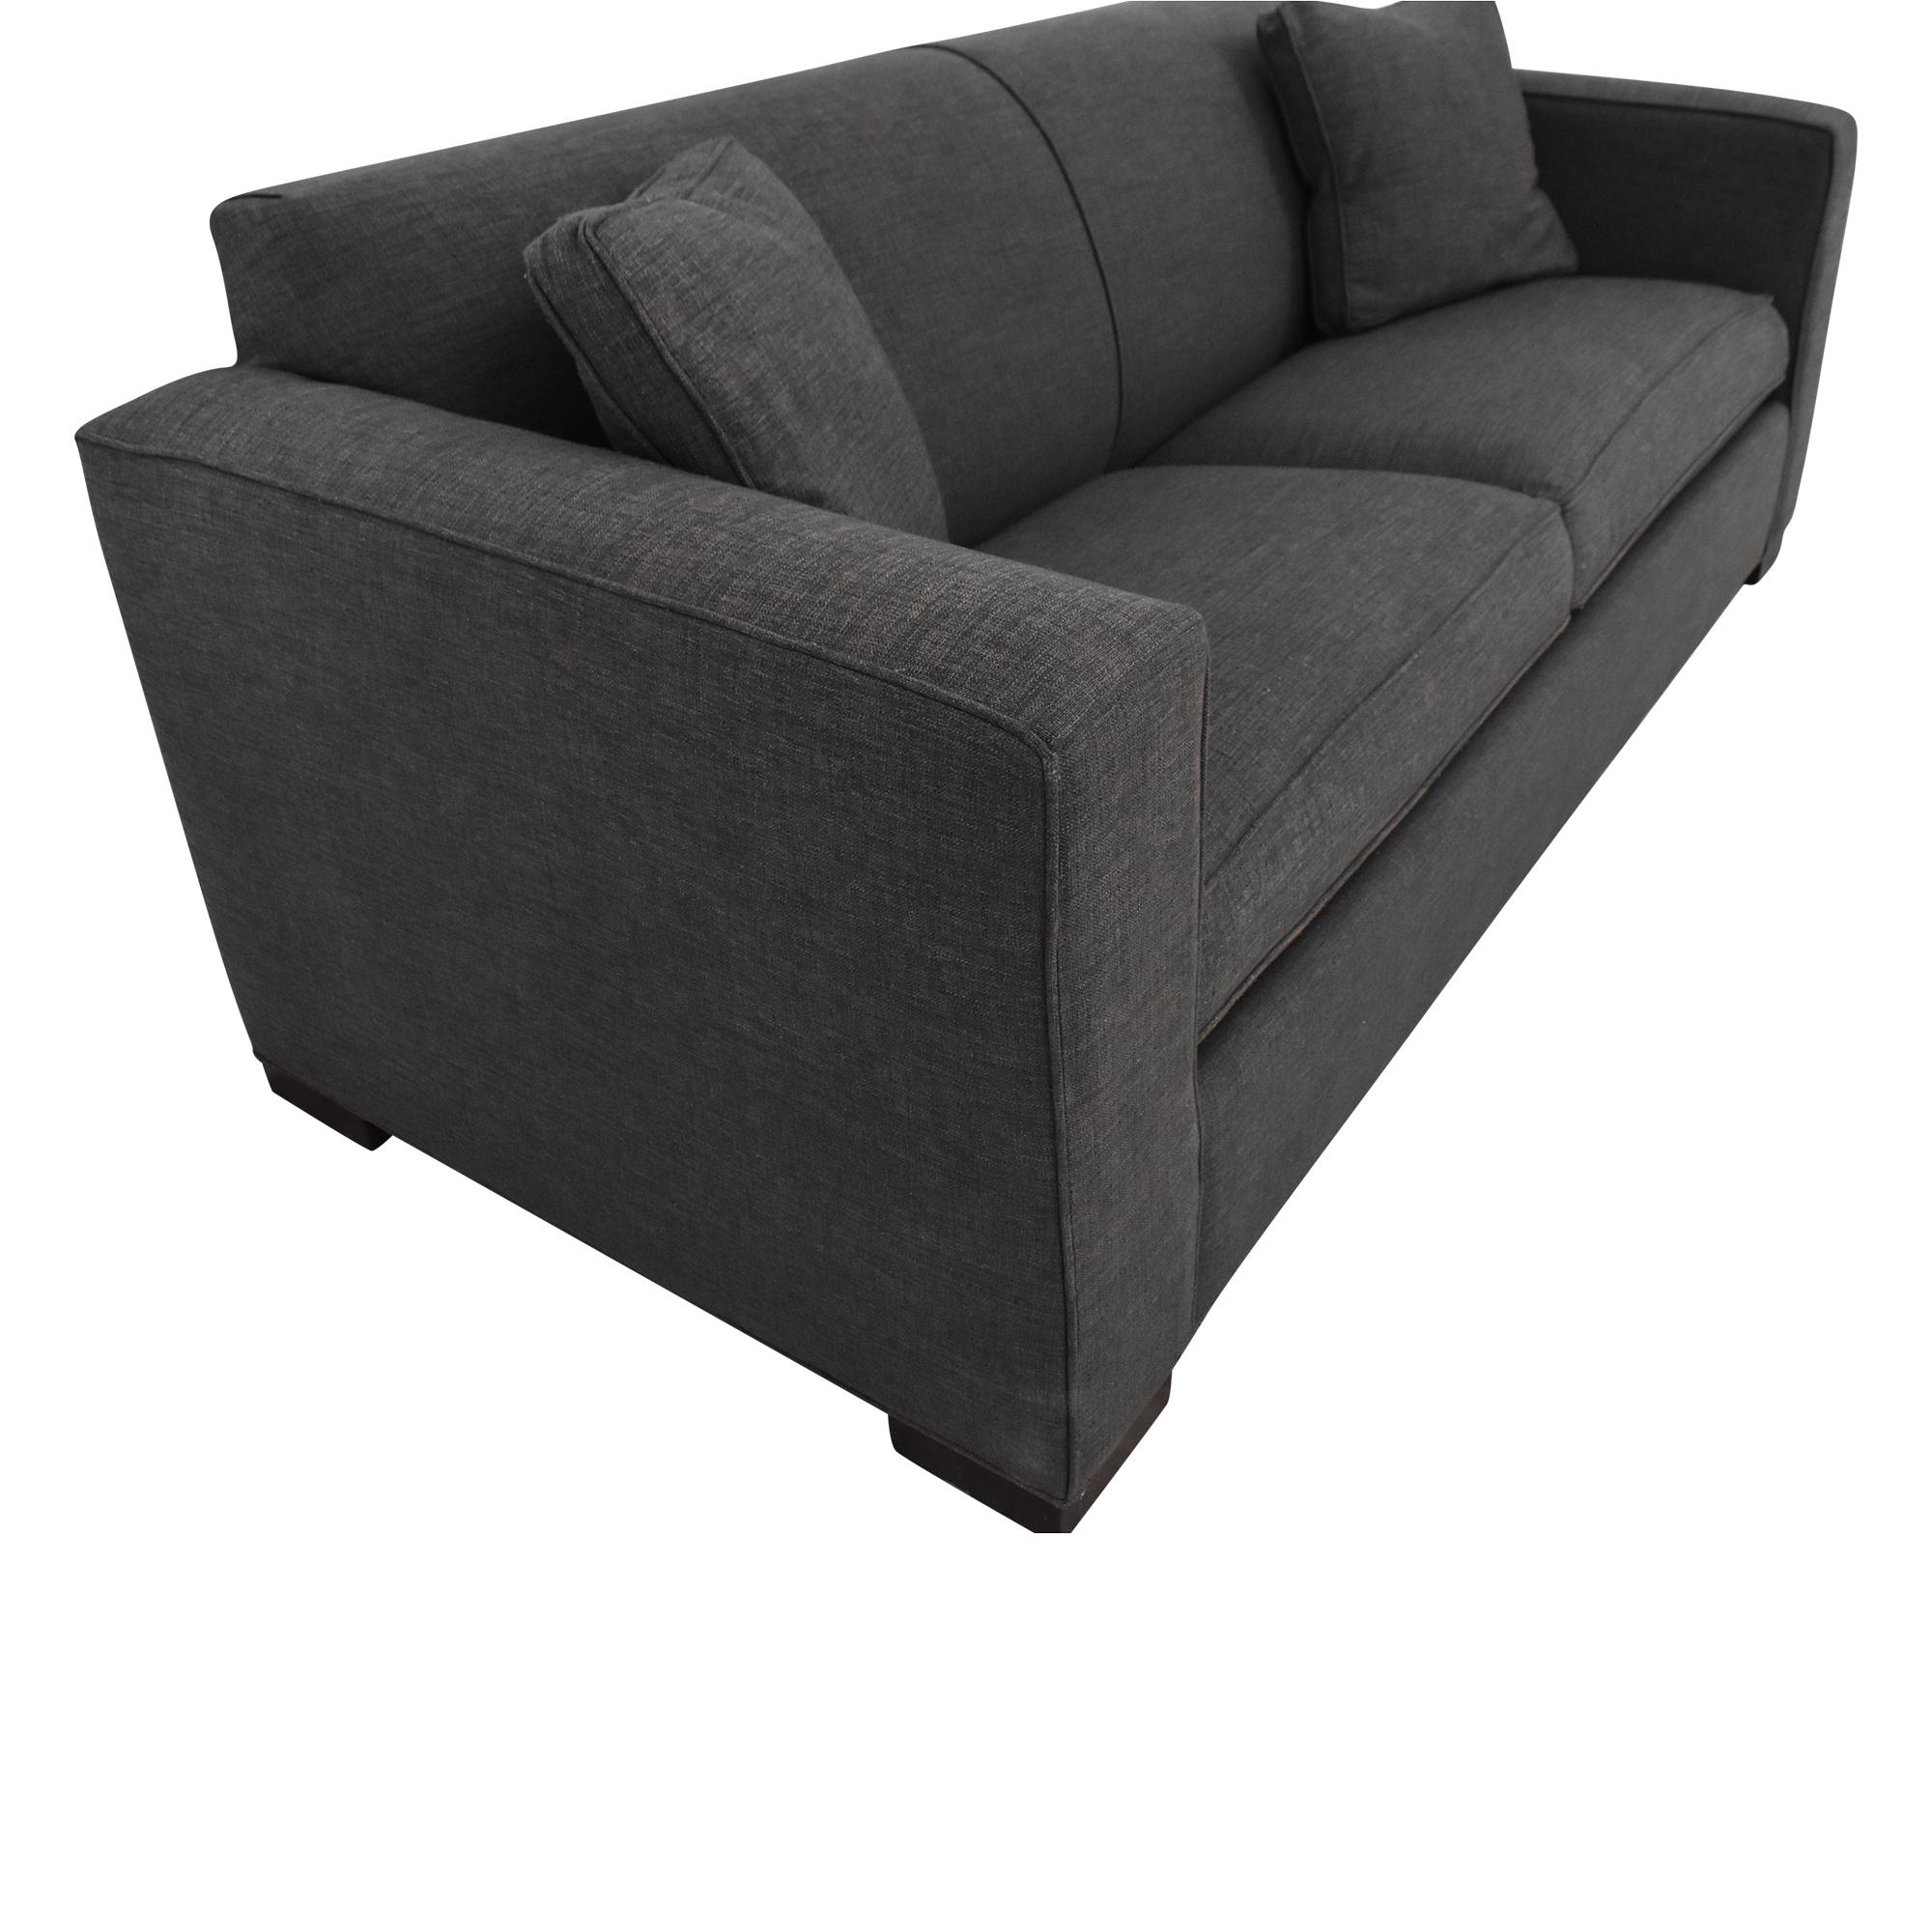 ABC Carpet & Home ABC Carpet & Home Cobble Hill Sleeper Sofa on sale